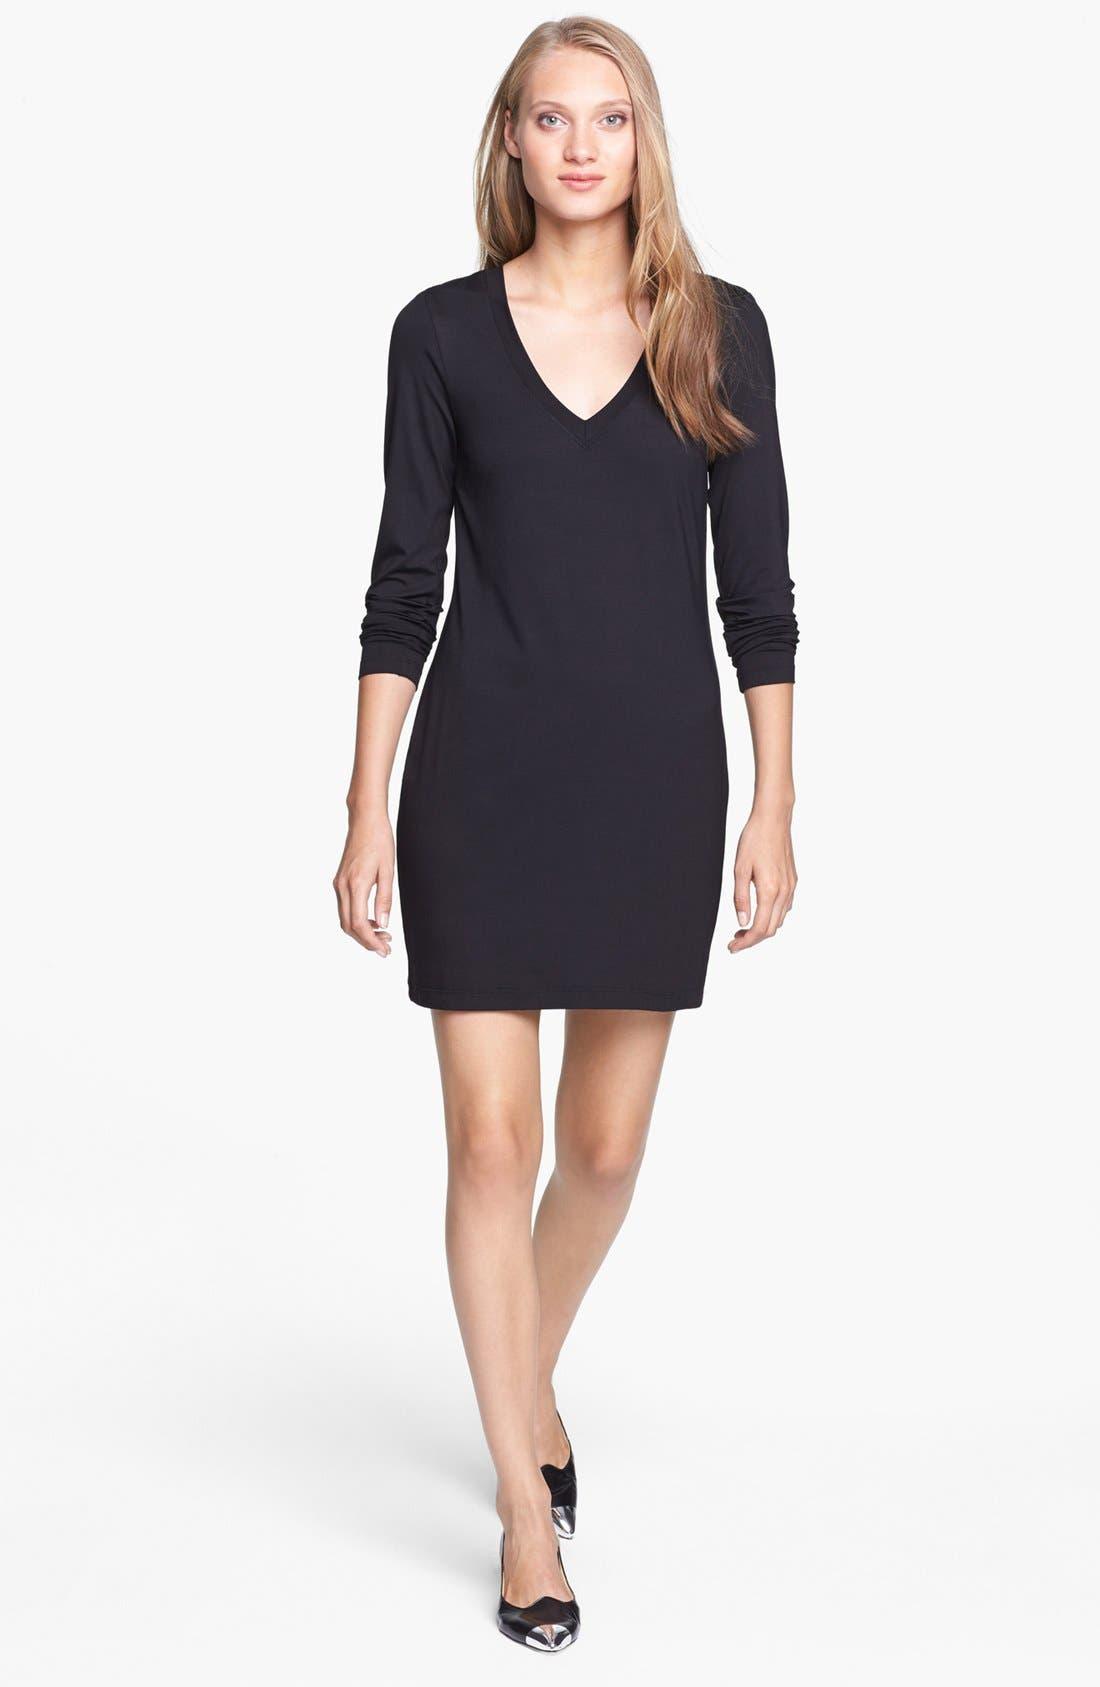 Alternate Image 1 Selected - Trina Turk 'Bellingham 2' Jersey T-Shirt Dress